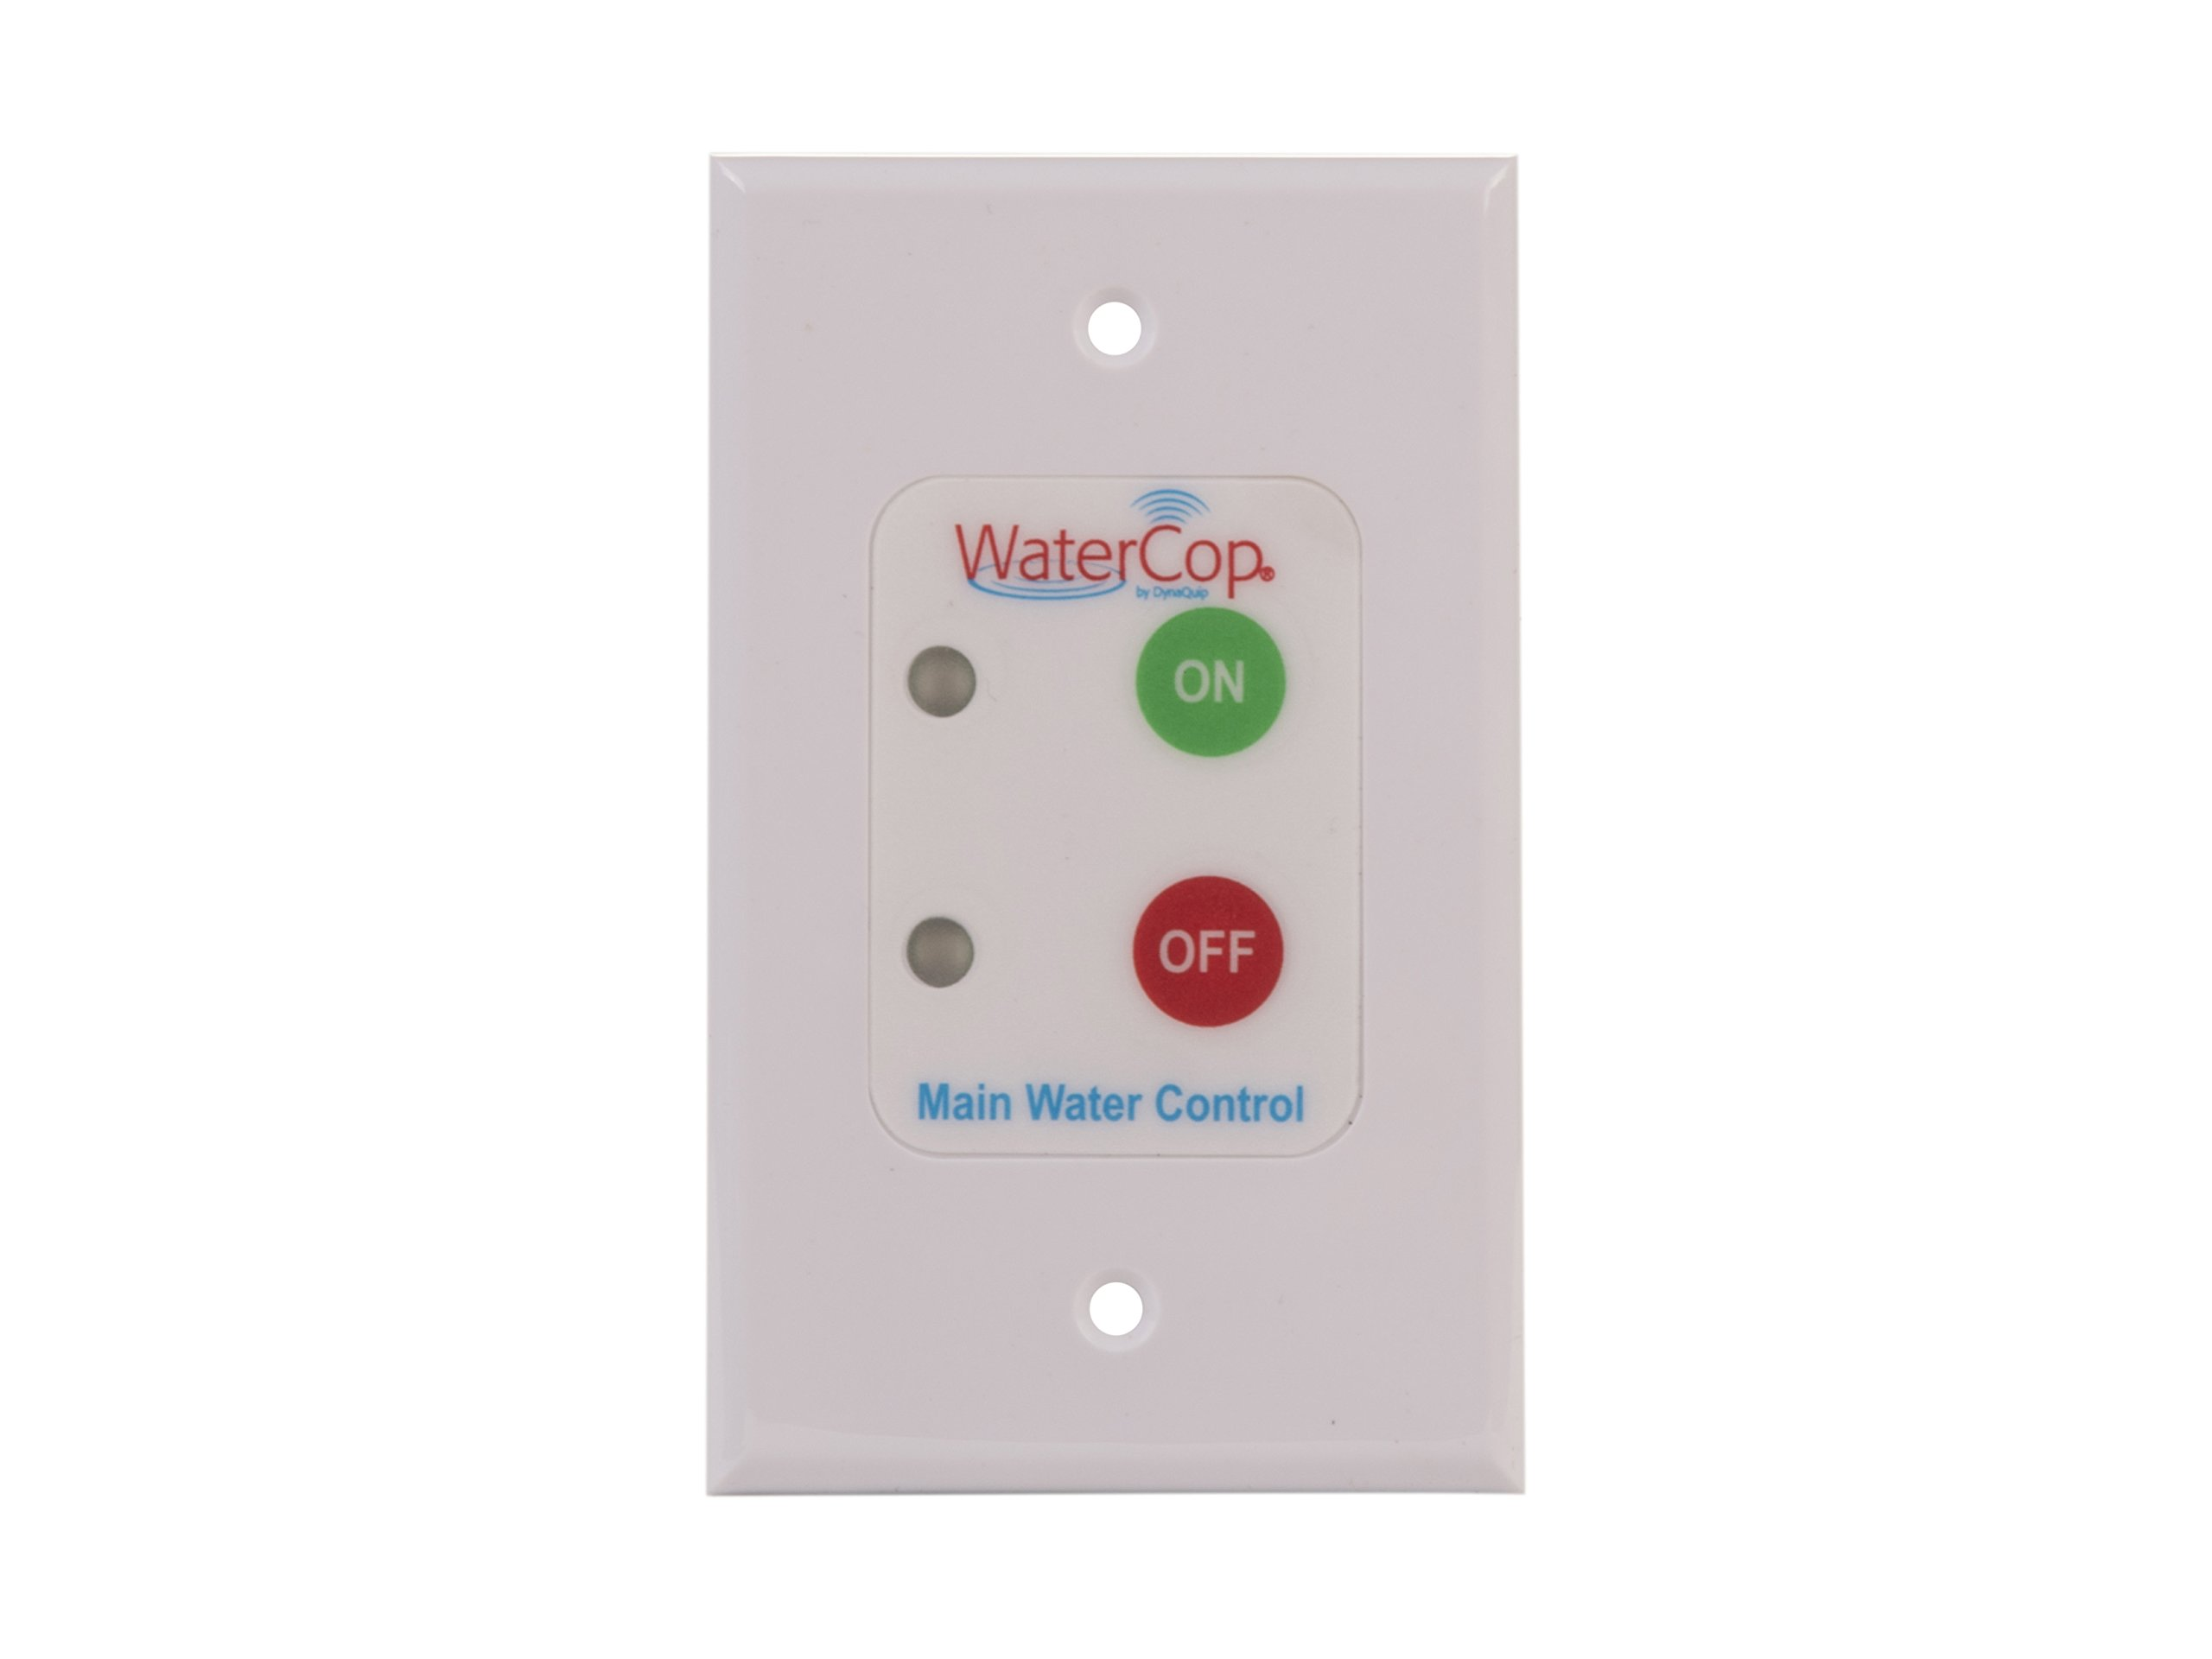 WaterCop Water Control Wall Switch